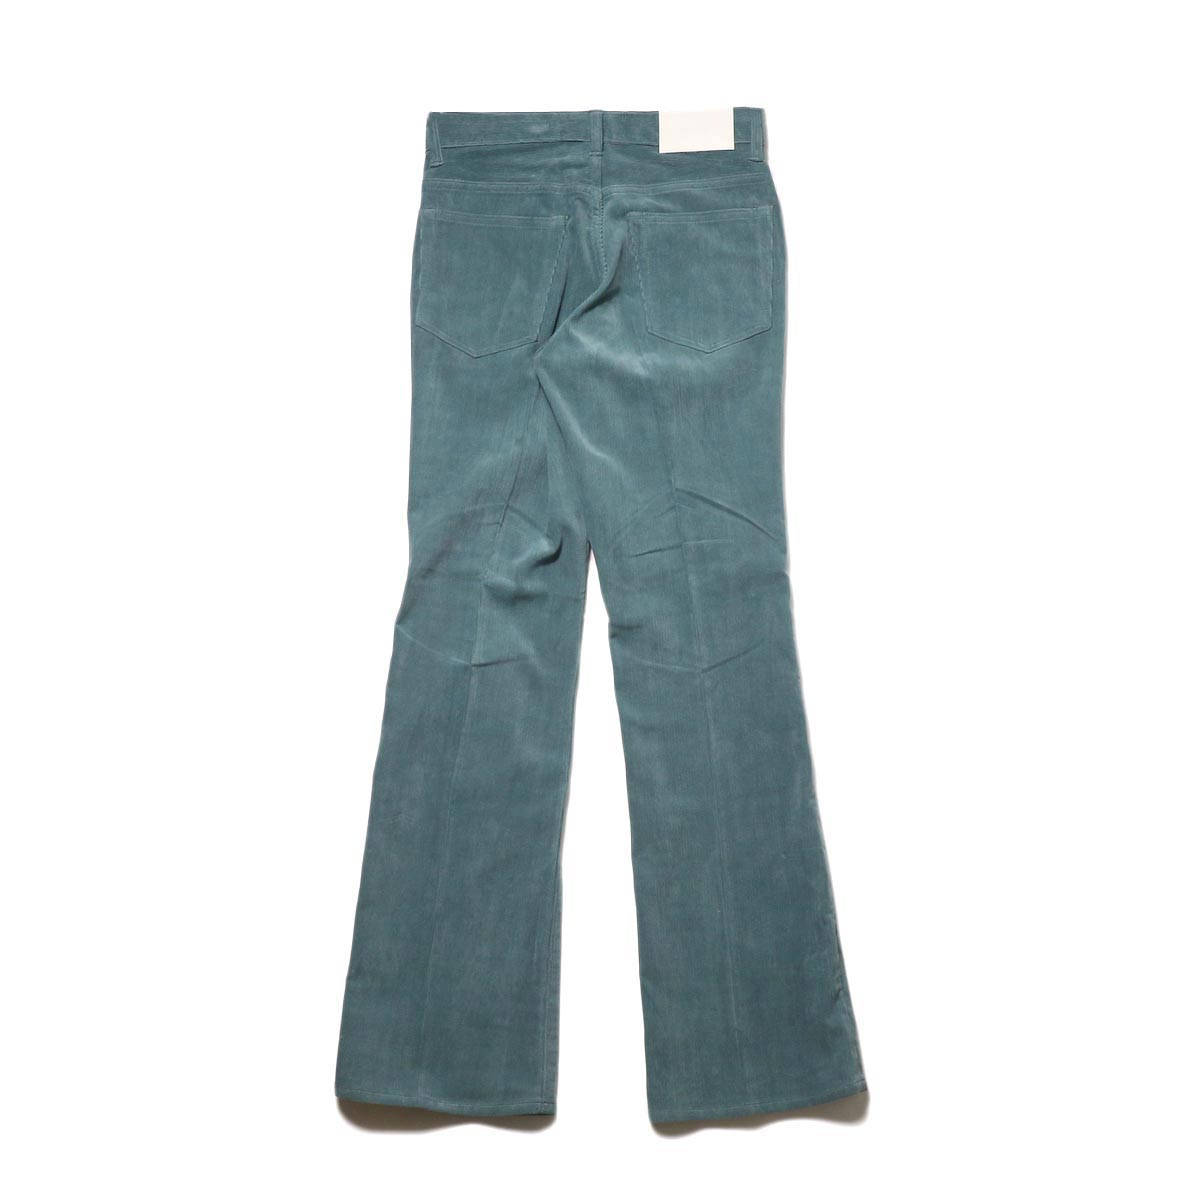 JANE SMITH / 5POCKET BOOTSCUT (jade green) 背面